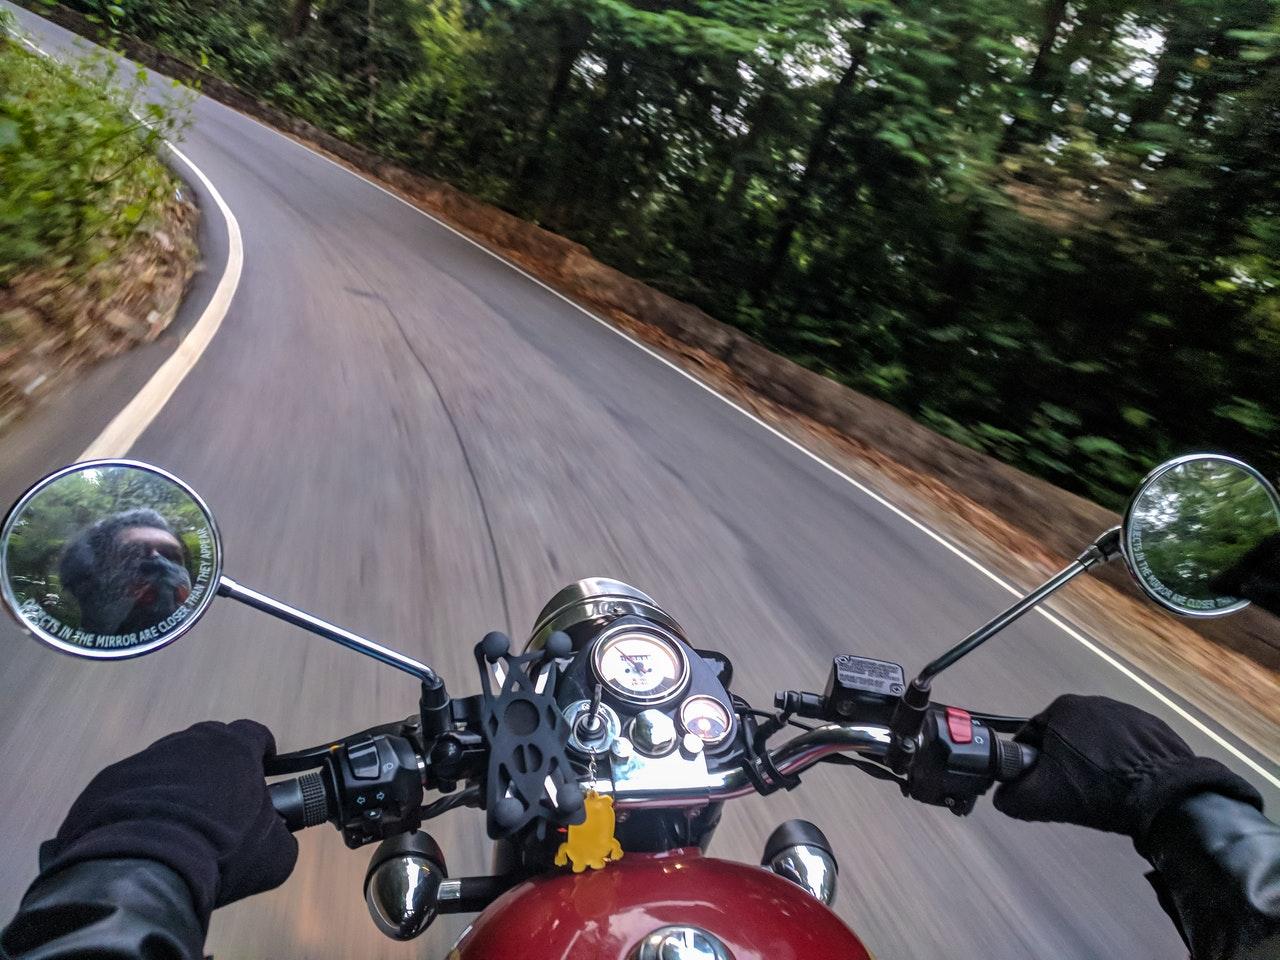 image en vue subjective d'un motard en train de conduire